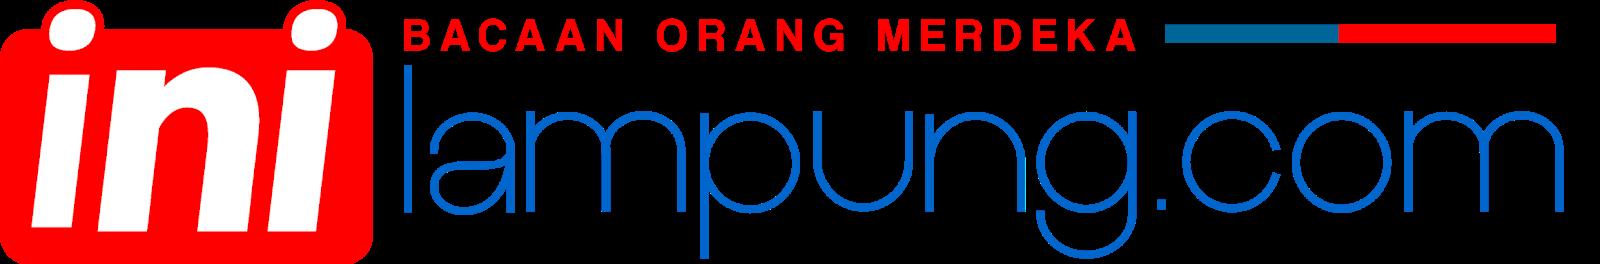 INILAMPUNG.COM